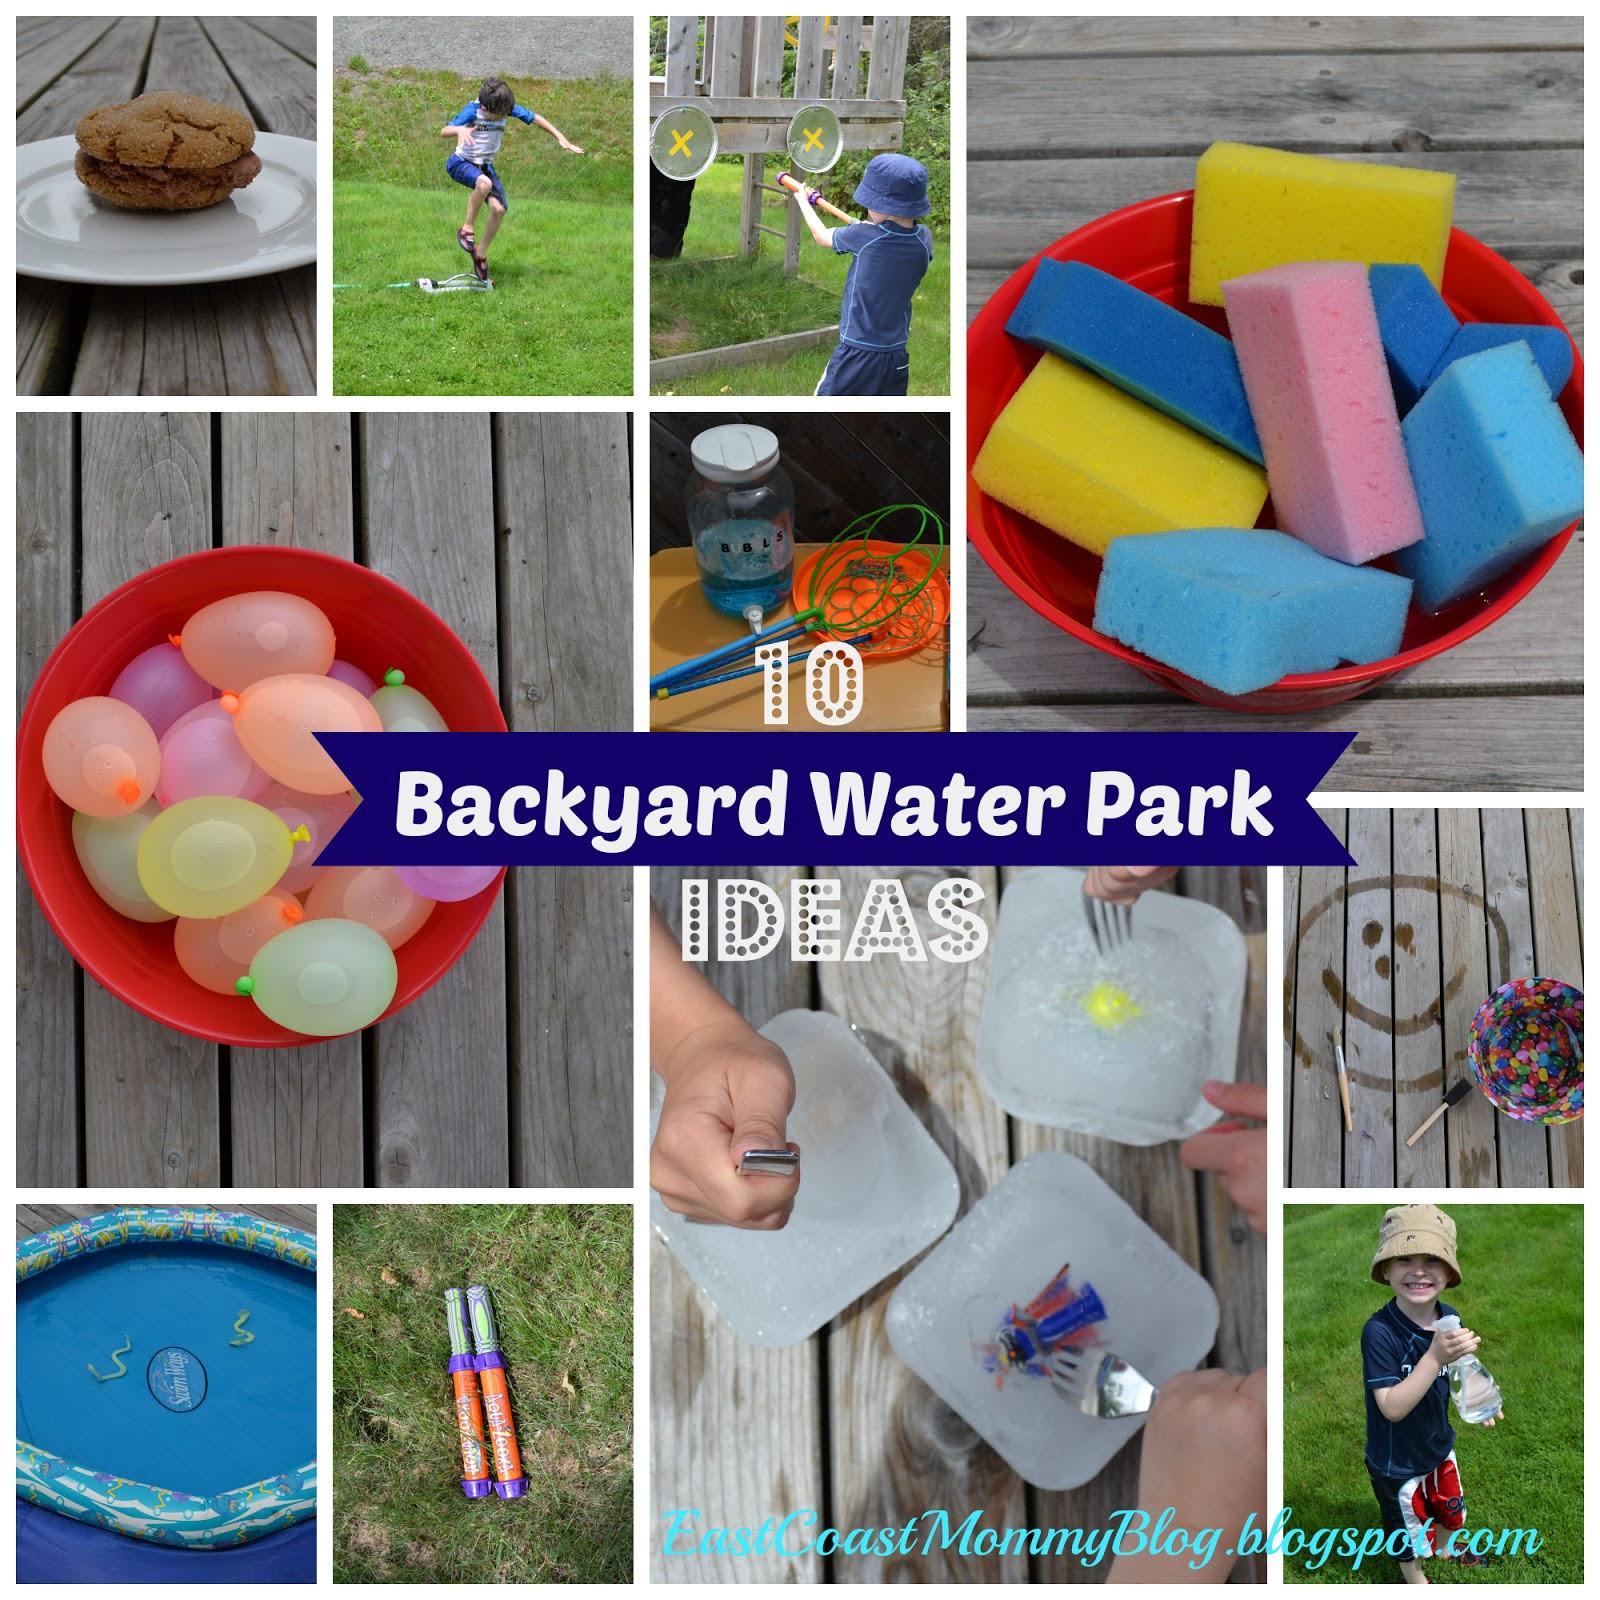 Backyard Water Park Party Ideas  East Coast Mommy 10 Easy DIY Backyard Water Park Ideas